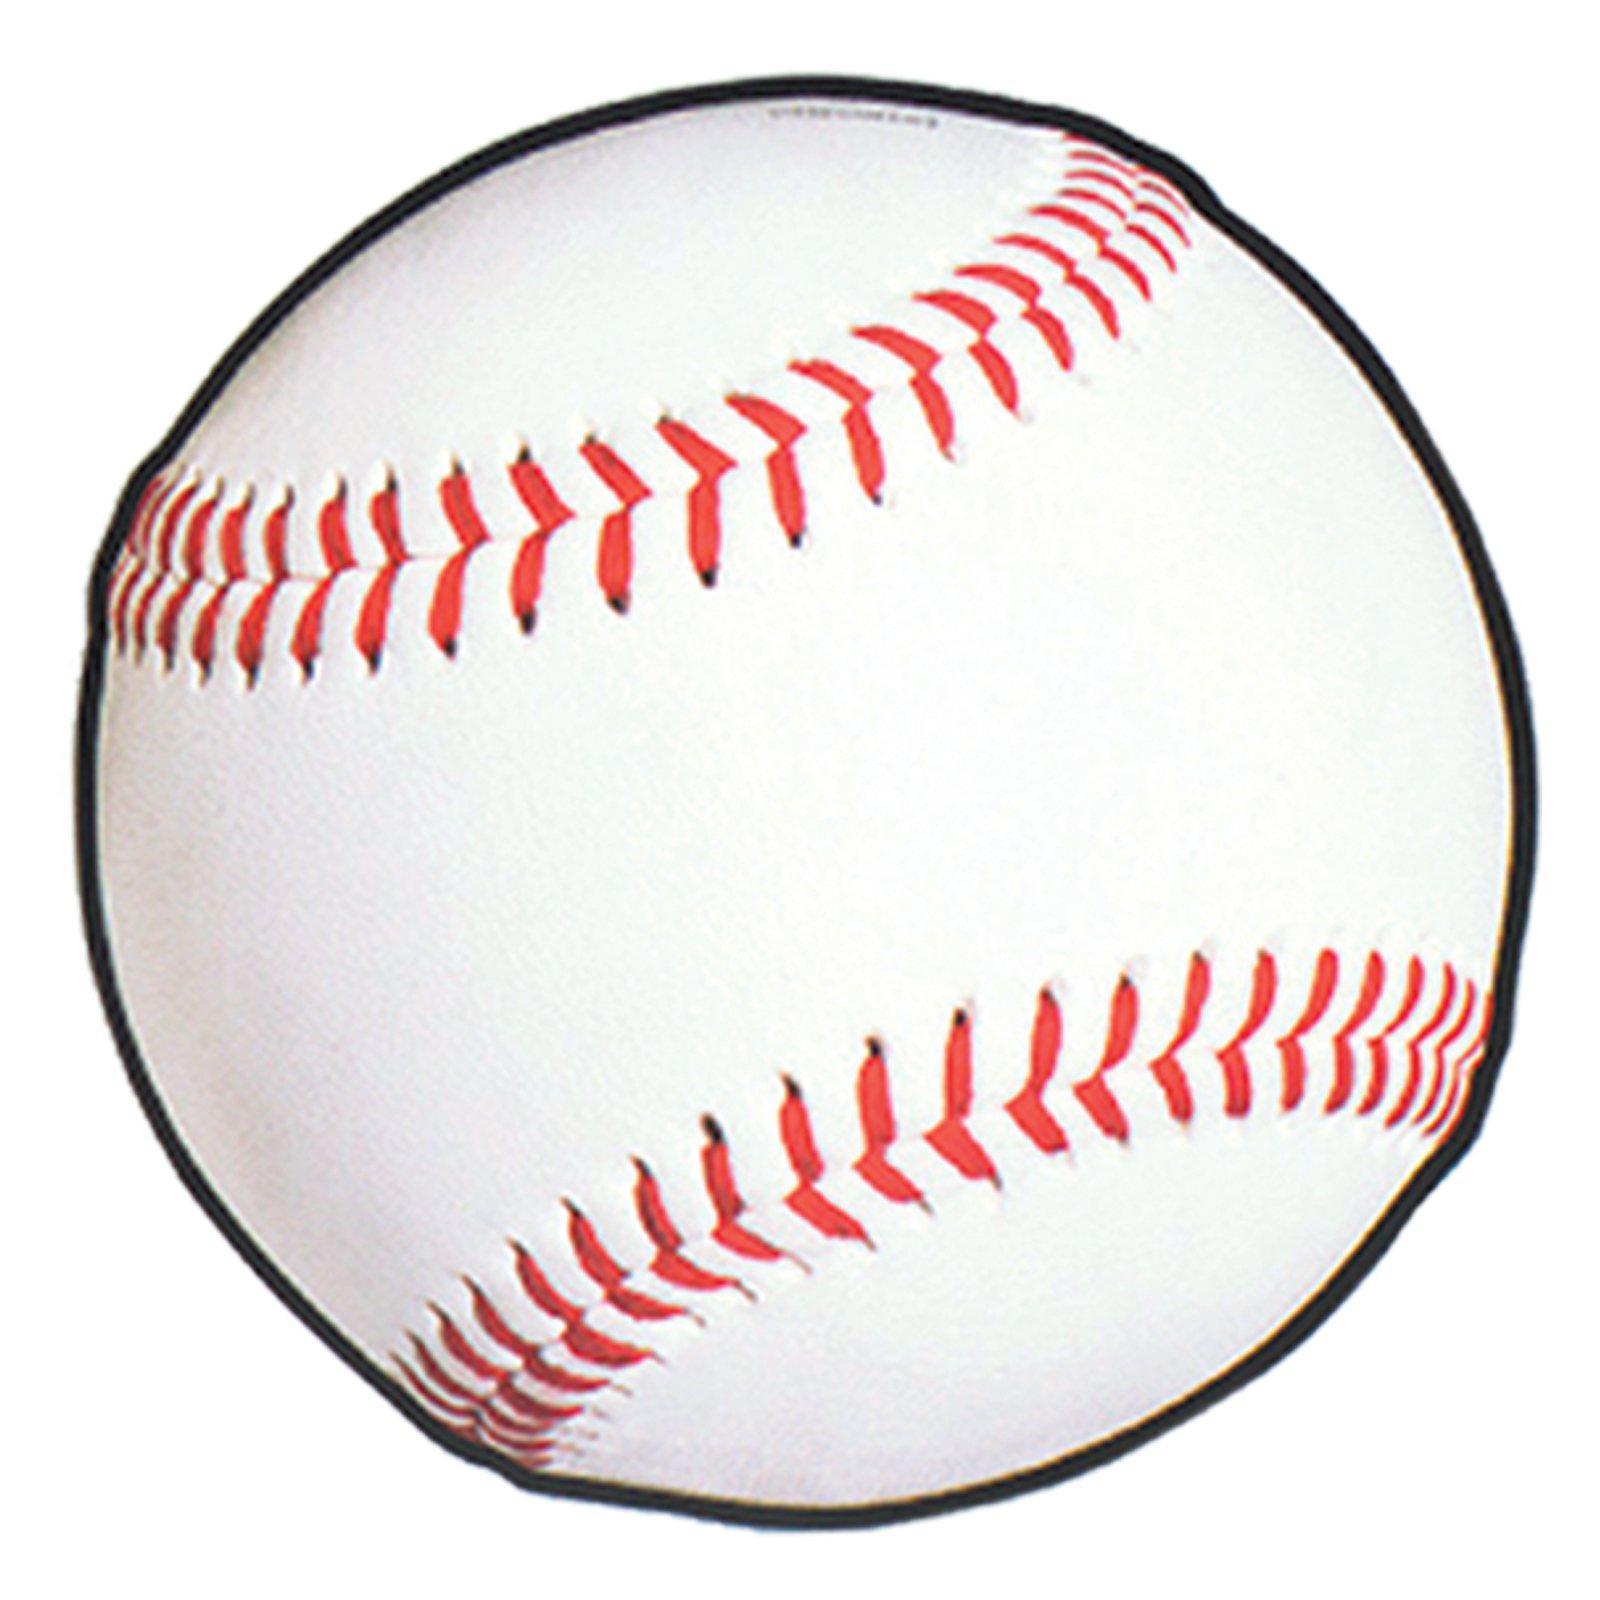 1600x1600 Free Baseball Clip Art Clipart Images 2